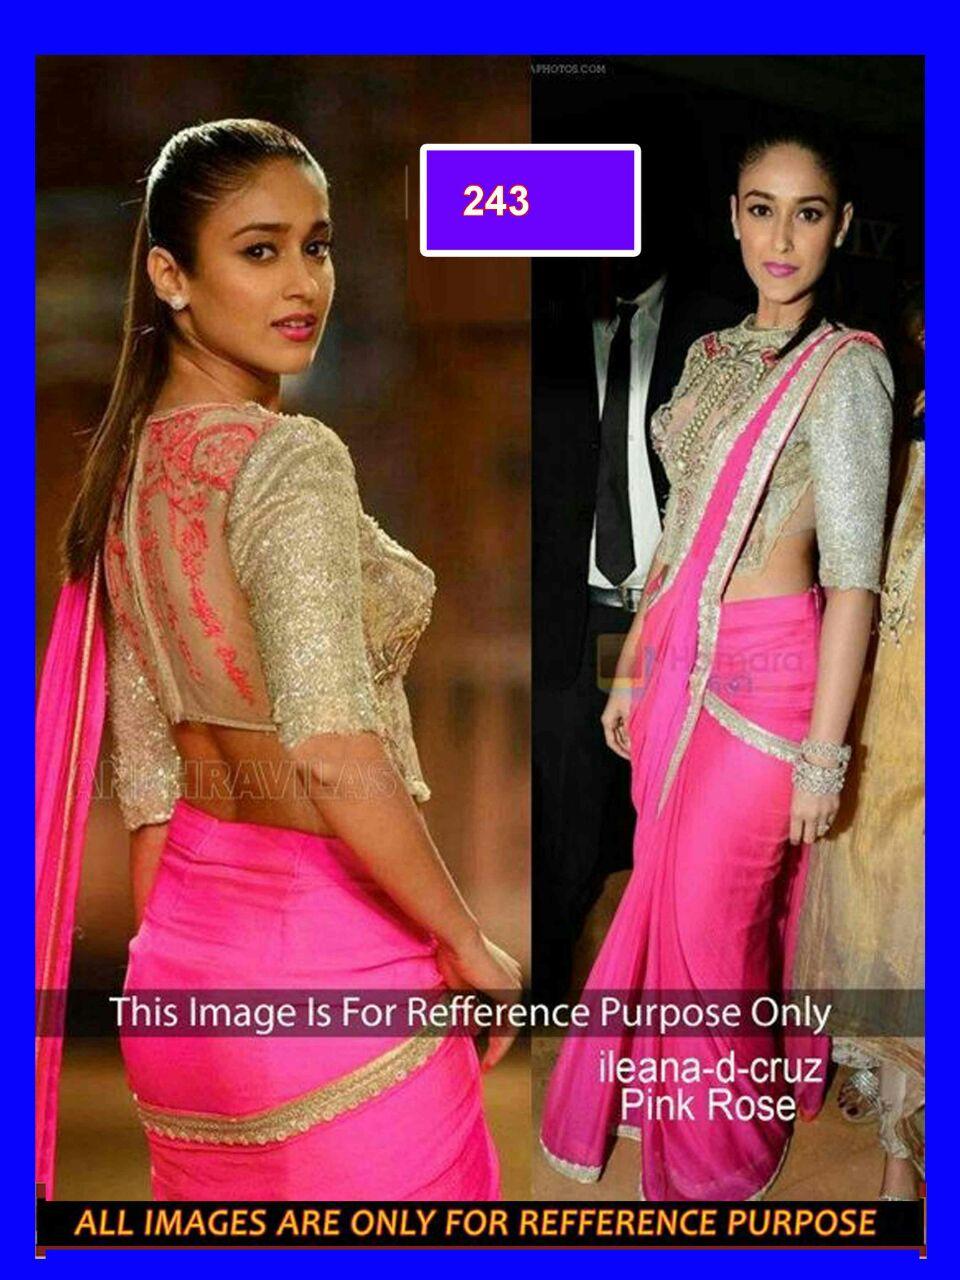 f66310b8402ab pink color plain chiffon sarees bollywood Illenana dCruz saree with blouse  - Bikaw - 333029